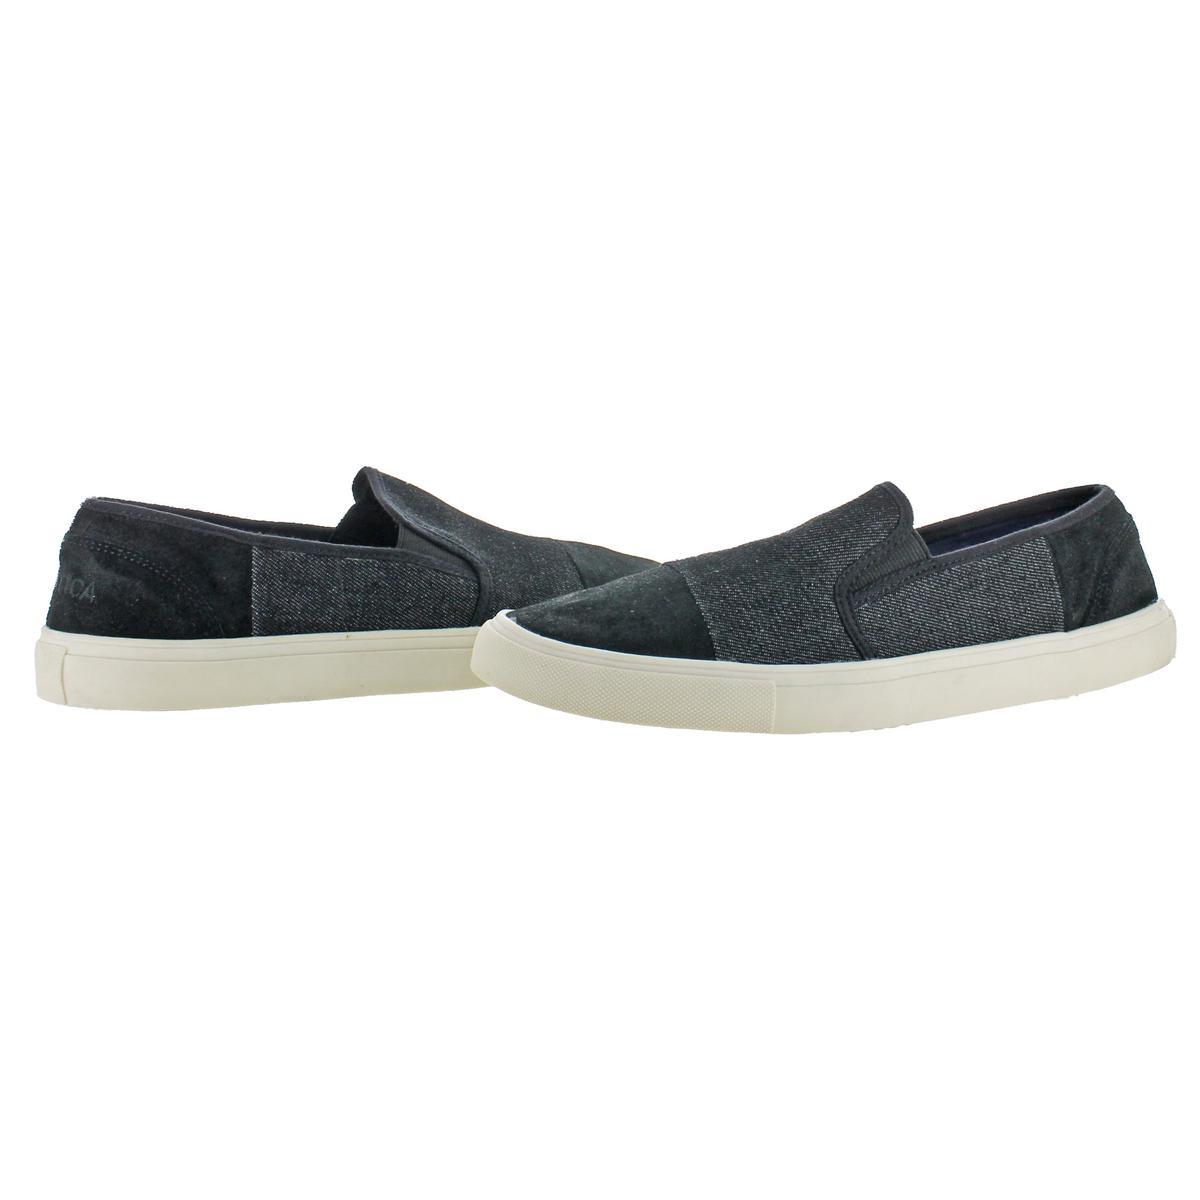 Nautica-Men-039-s-Kapena-Canvas-Denim-Low-Top-Slip-On-Fashion-Sneakers-Shoes thumbnail 3